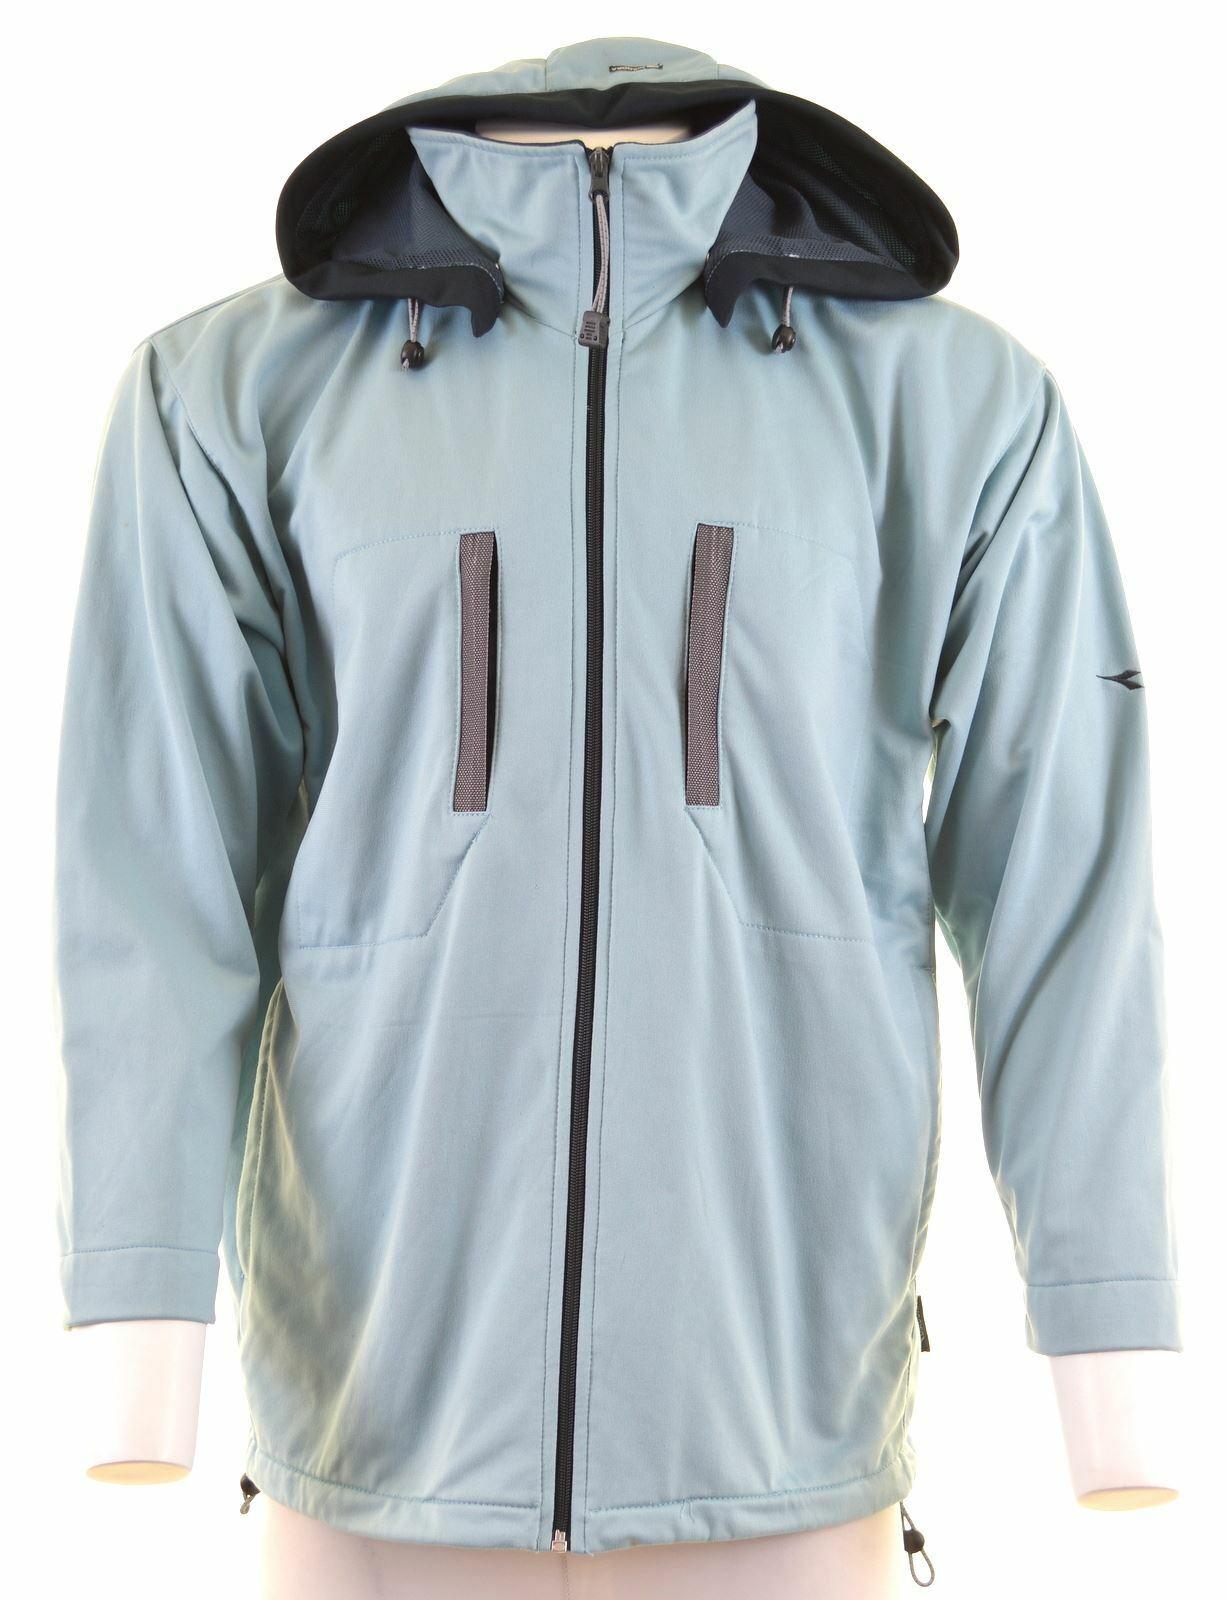 DIADORA Mens Hooded Tracksuit Top Jacket UK 44 2XL Blue Polyester JS13